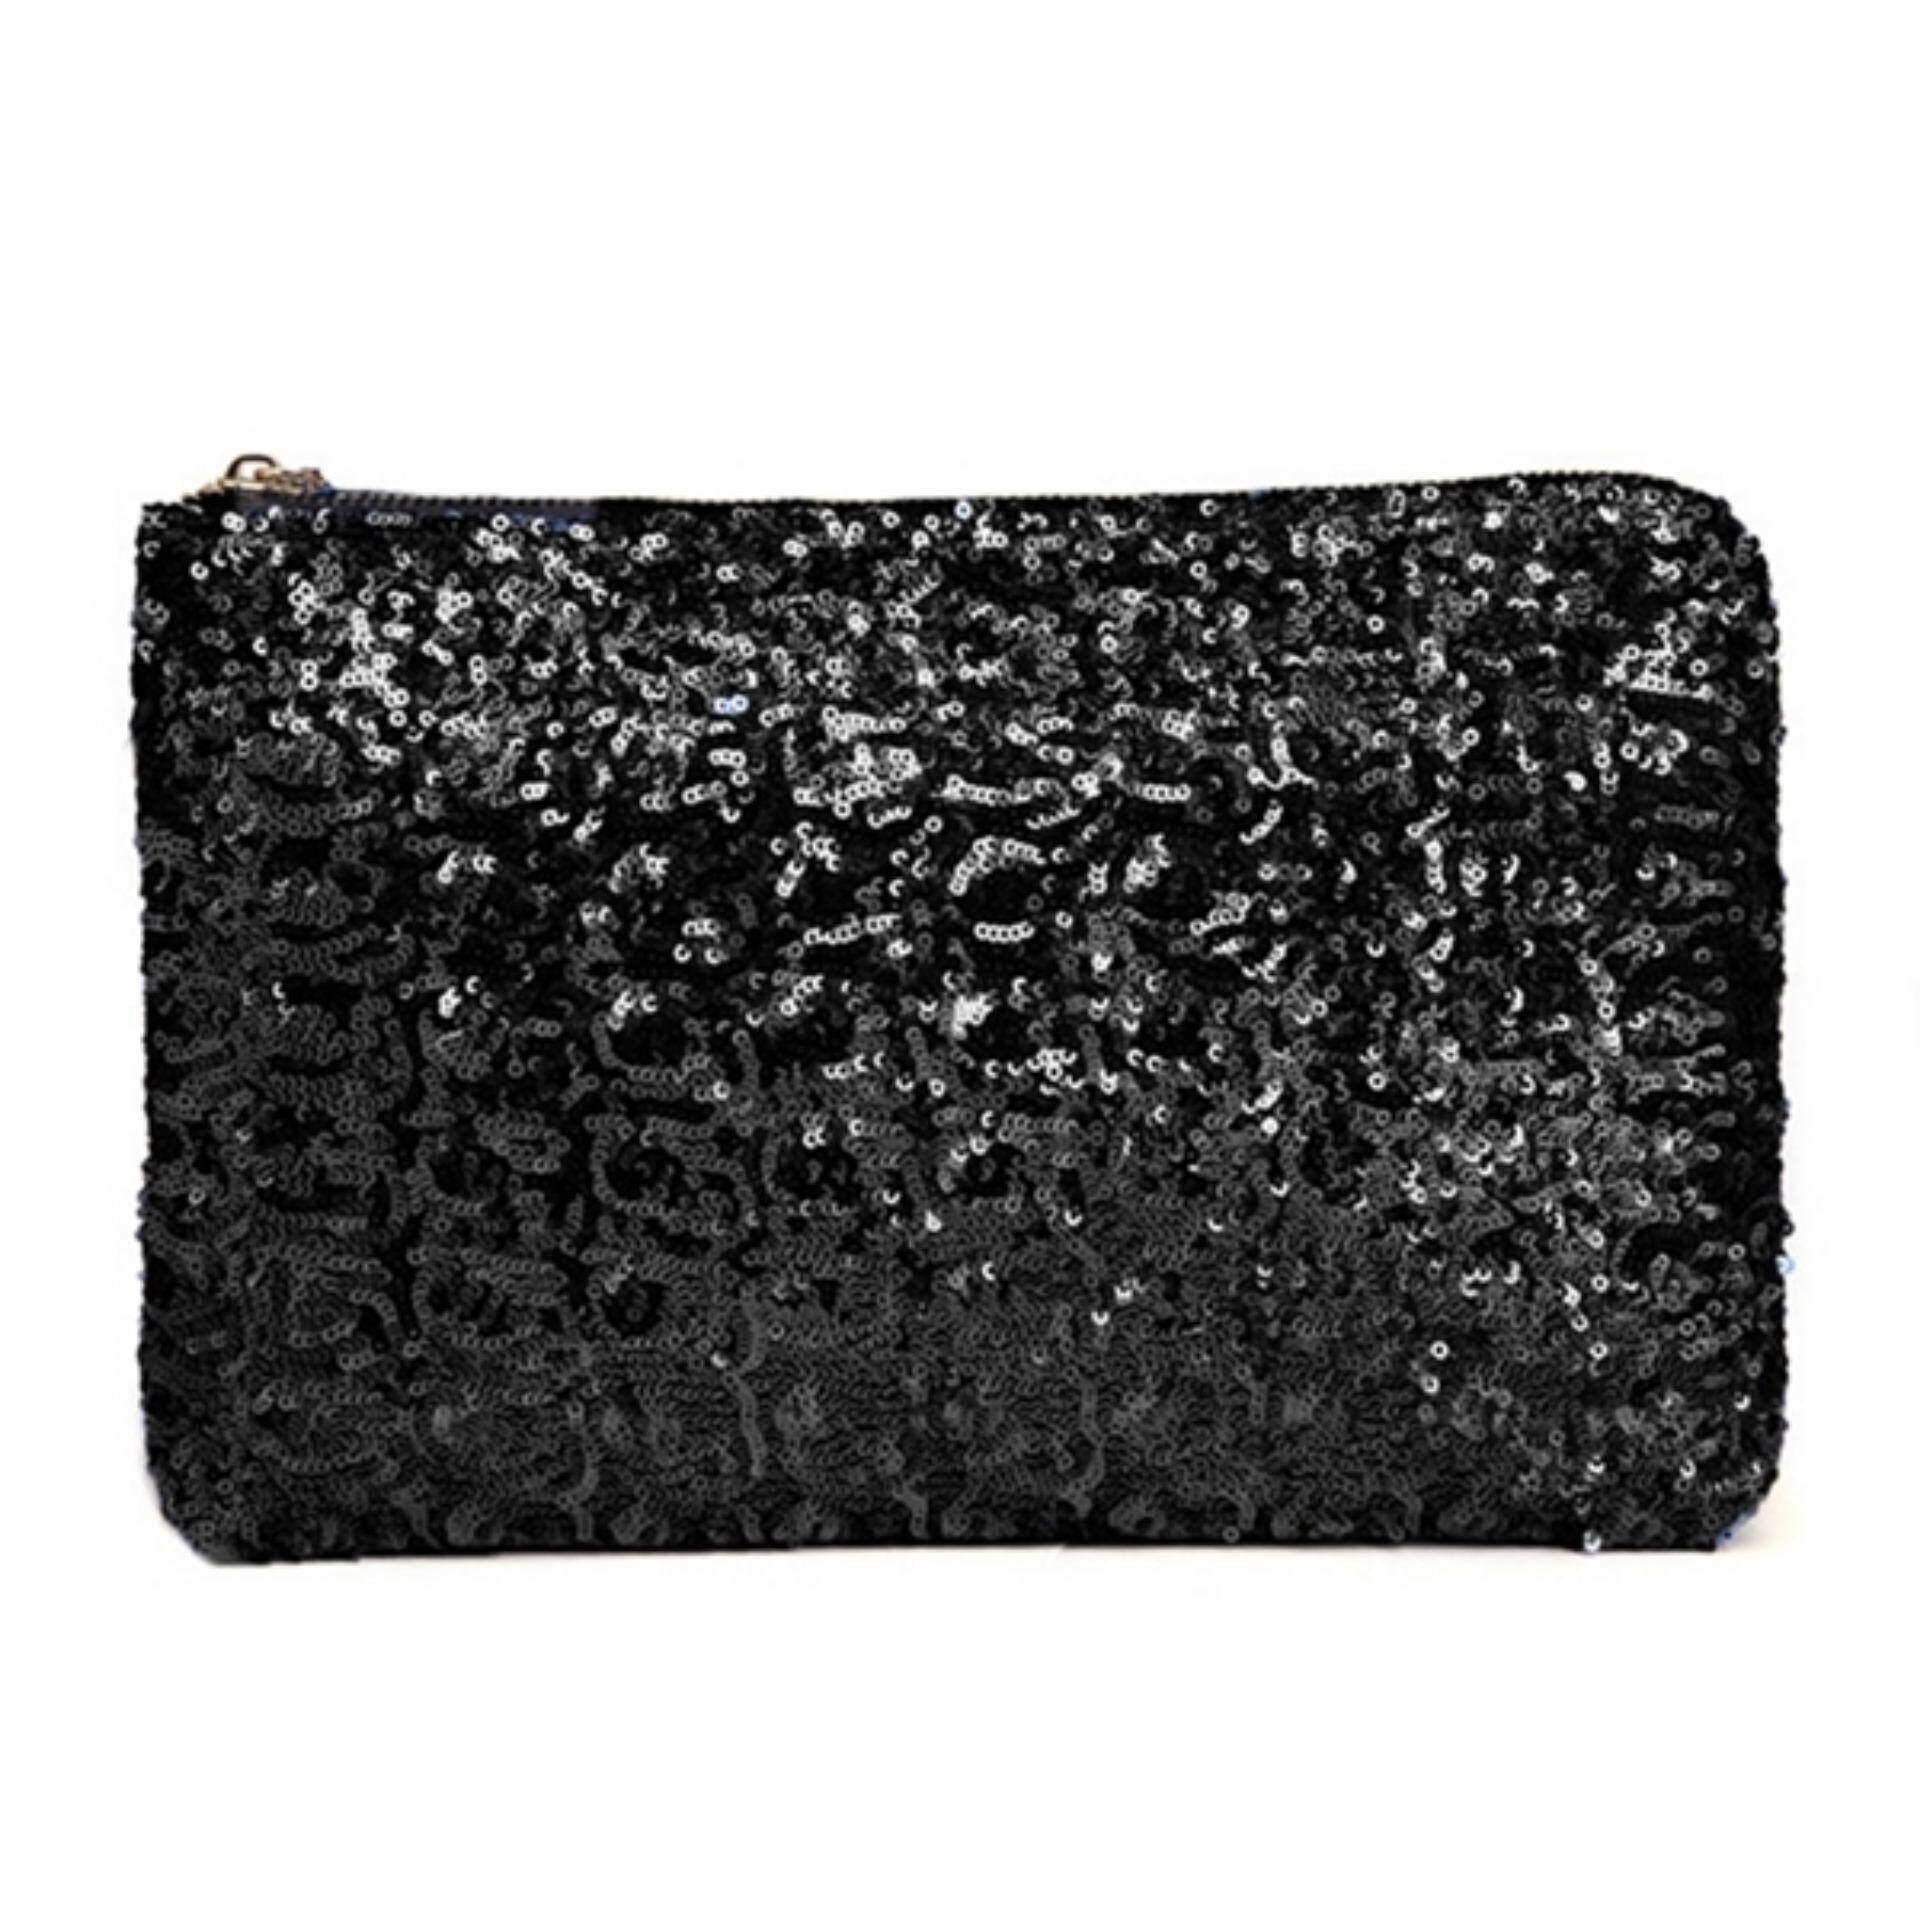 0d421cbab82 TEEMI Sequins Metallic Glitter Clutch Evening Dinner Purse Women HandBag  Dazzling Sparkling Party Bag - Black